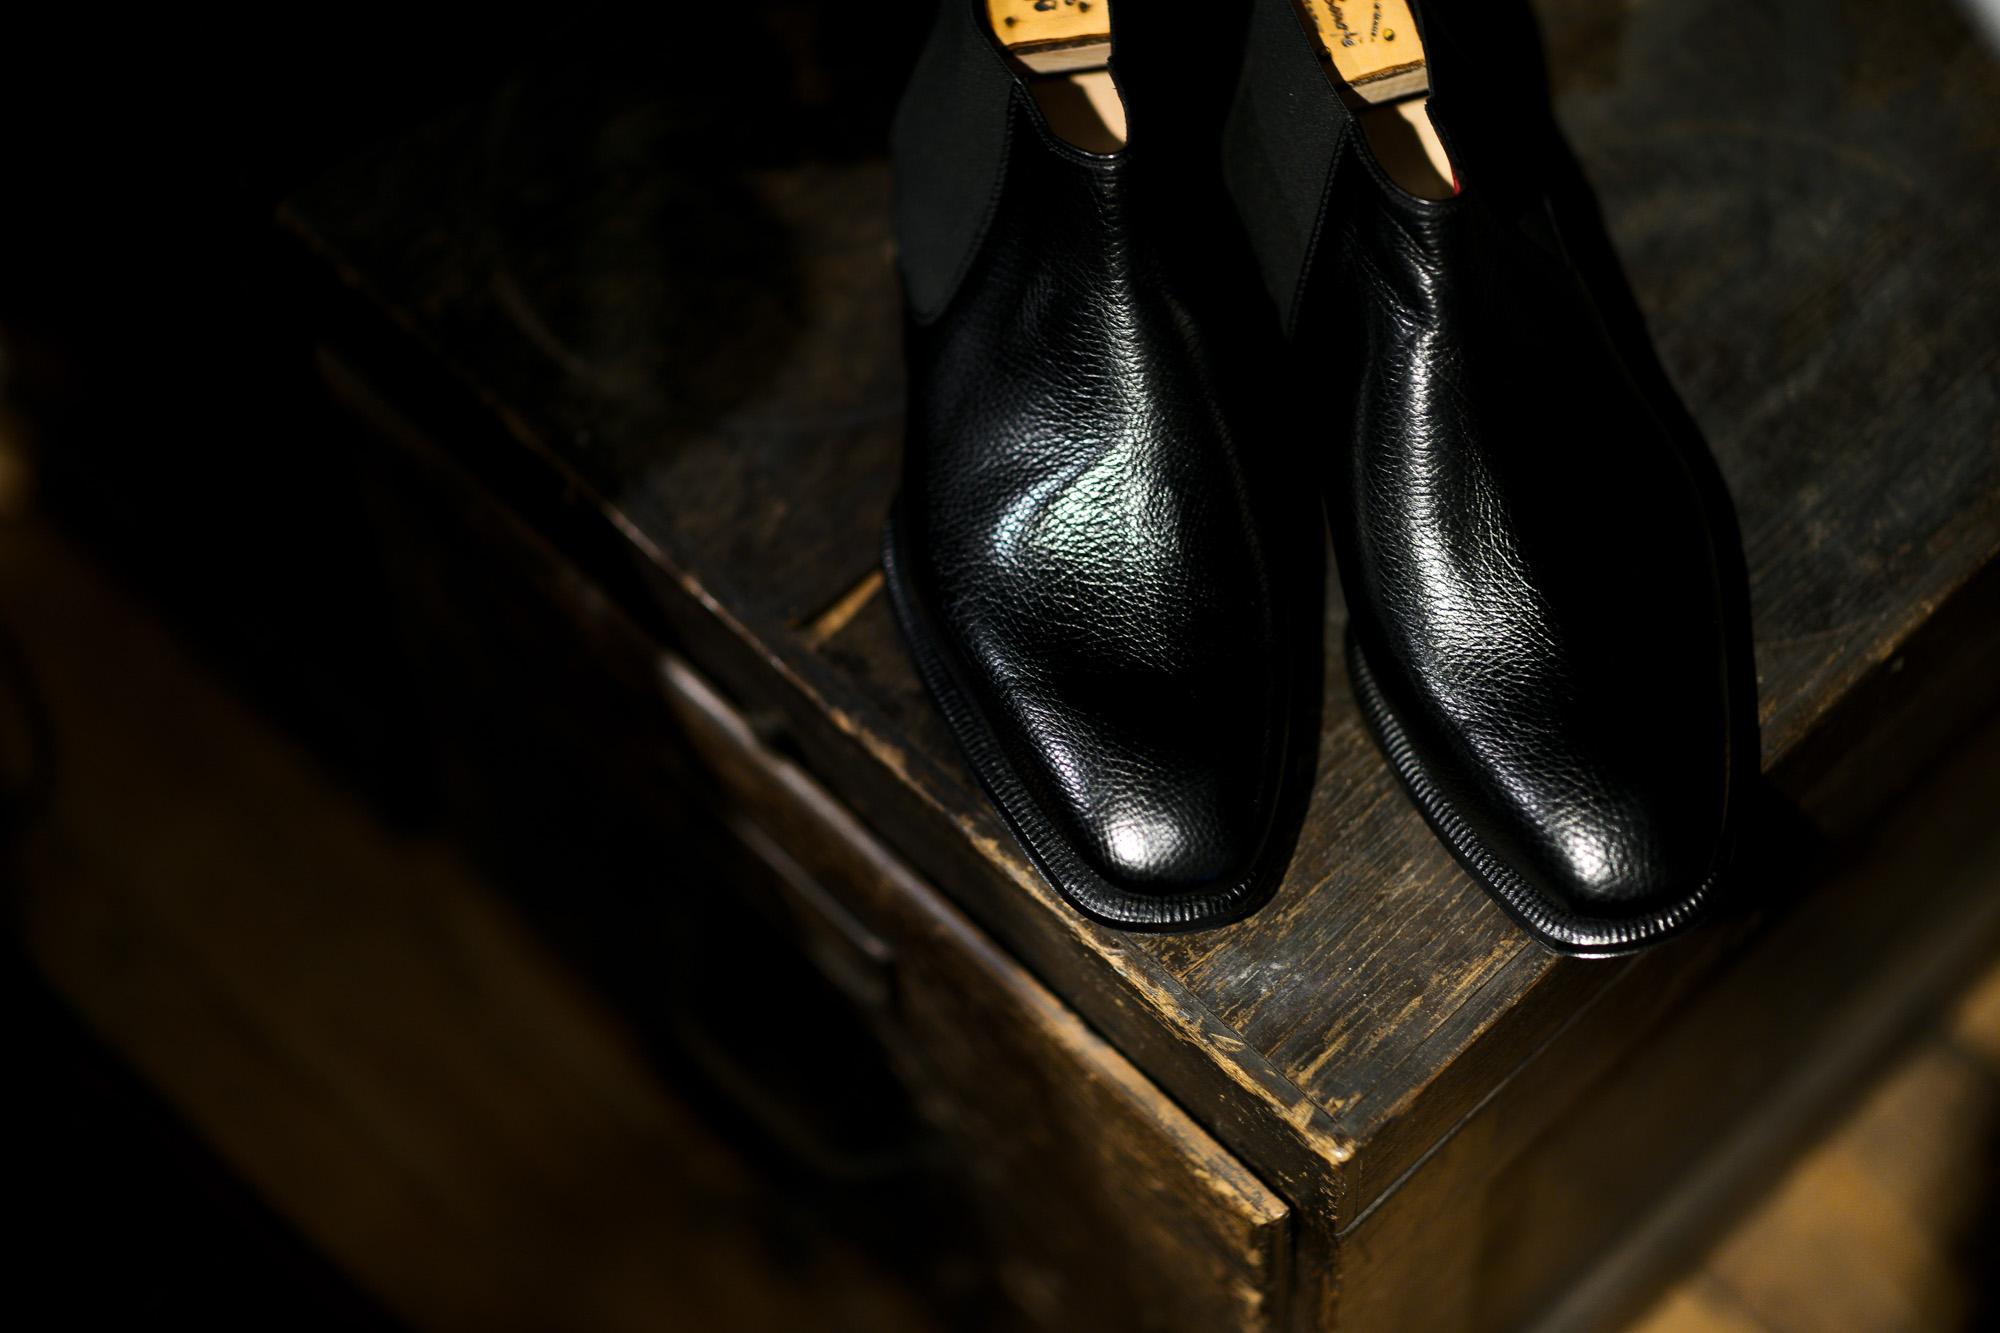 ENZO BONAFE ART.CARY GRANT III Side gore Boots LAMA LEATHER NERO 2021 愛知 名古屋 Alto e Diritto altoediritto アルトエデリット エンツォボナフェ ゲーリーグラント3 サイドゴアブーツ ラマレザー ブラック ドレスブーツ